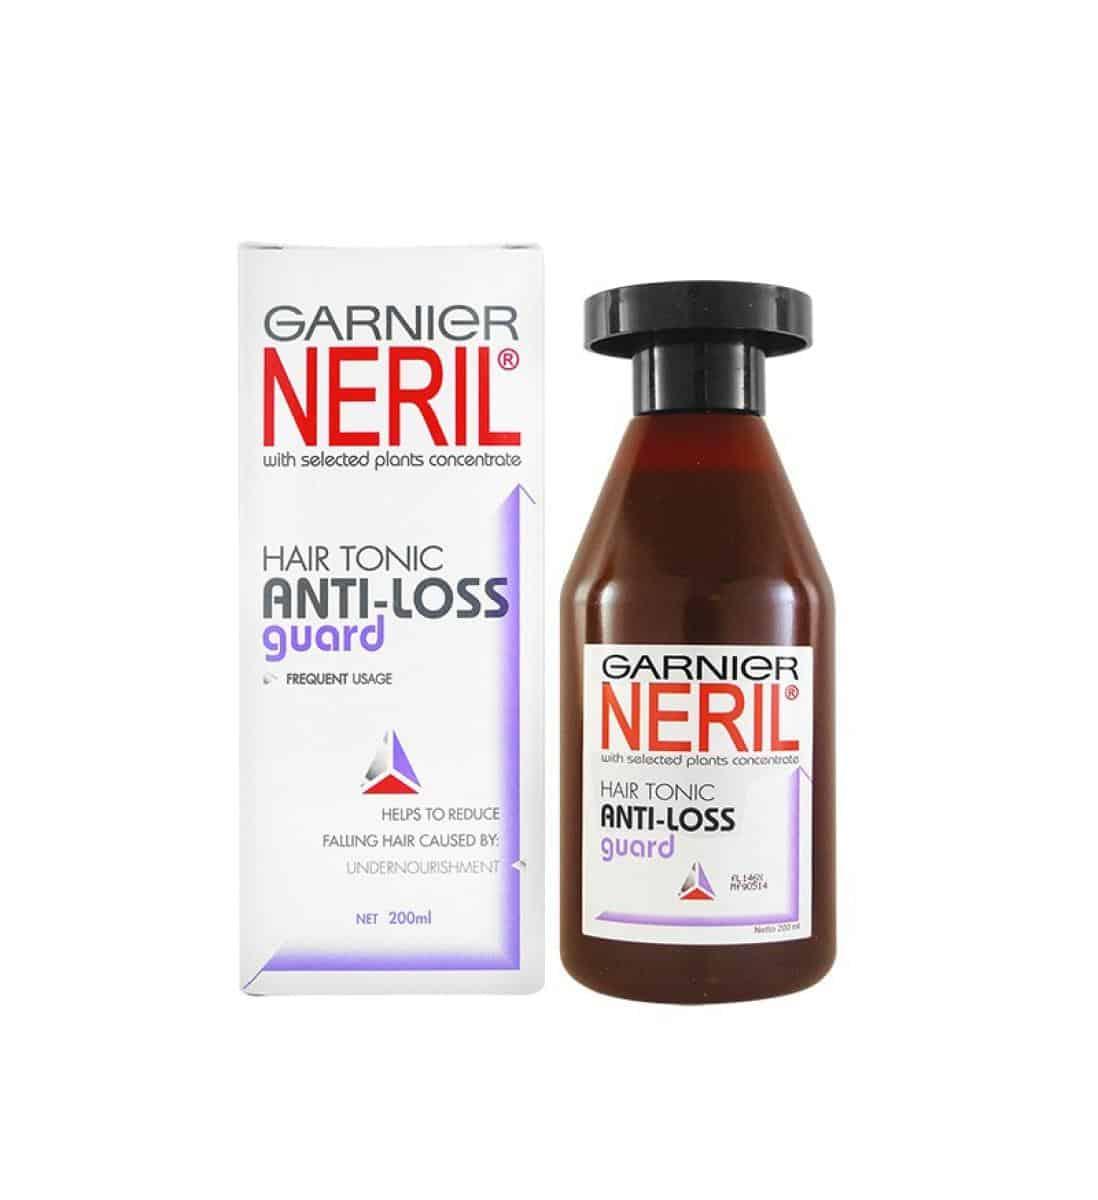 Garnier-Neril-Hair-Tonic-AntiLoss-Guard